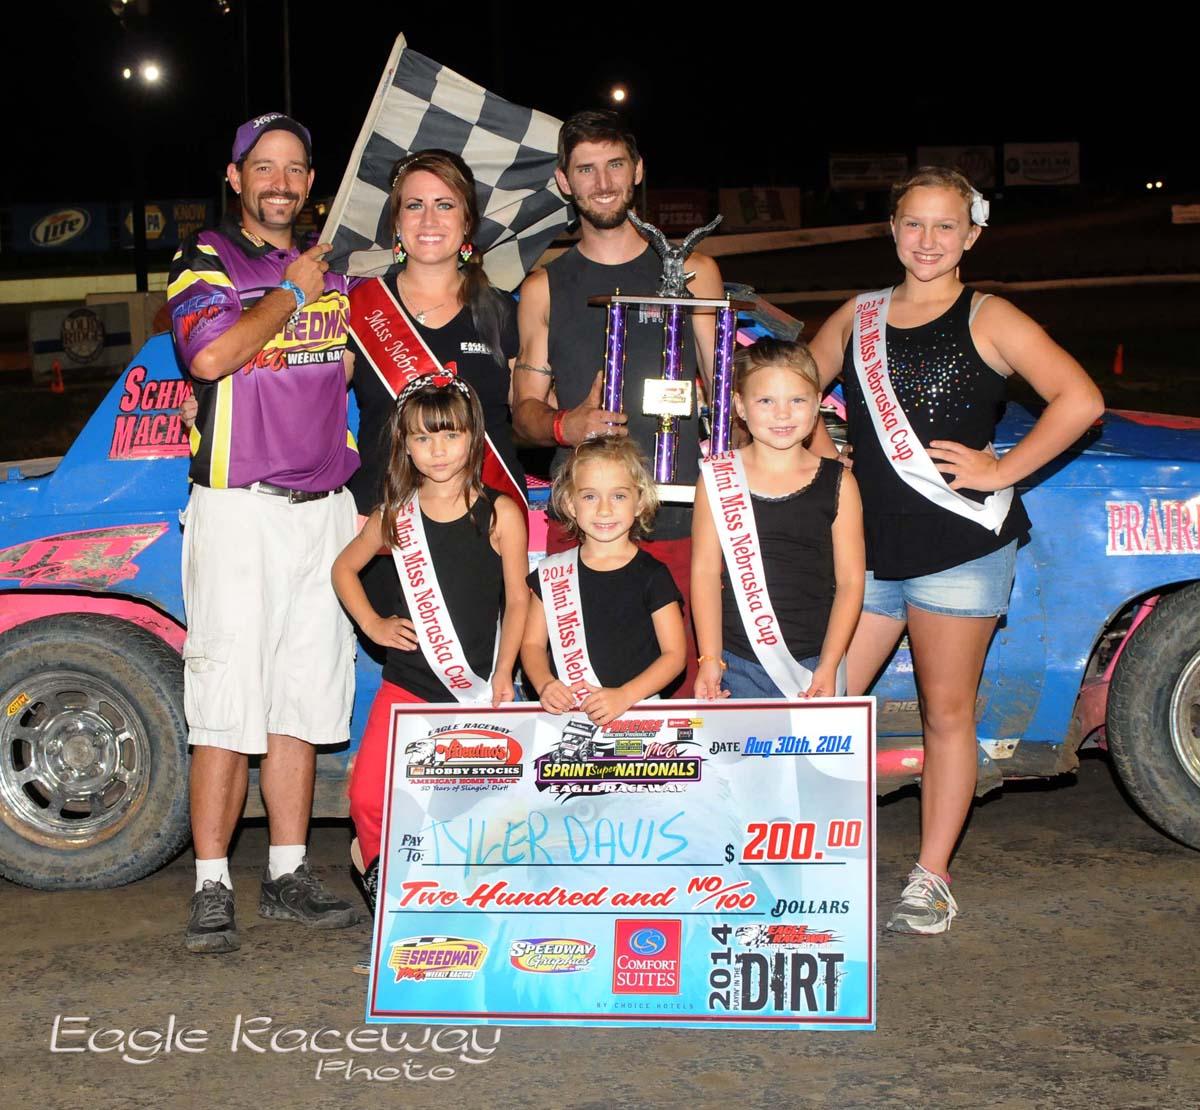 Eagle-08-30-14-457-Tyler-Davis-with-2013-Miss-Nebraska-Cup-Elle-Potocka-along-with-2014-Mini-Miss-Nebraska-Cup-finailist-and-flagman-Billy-Lloyd-JoeOrthPhoto